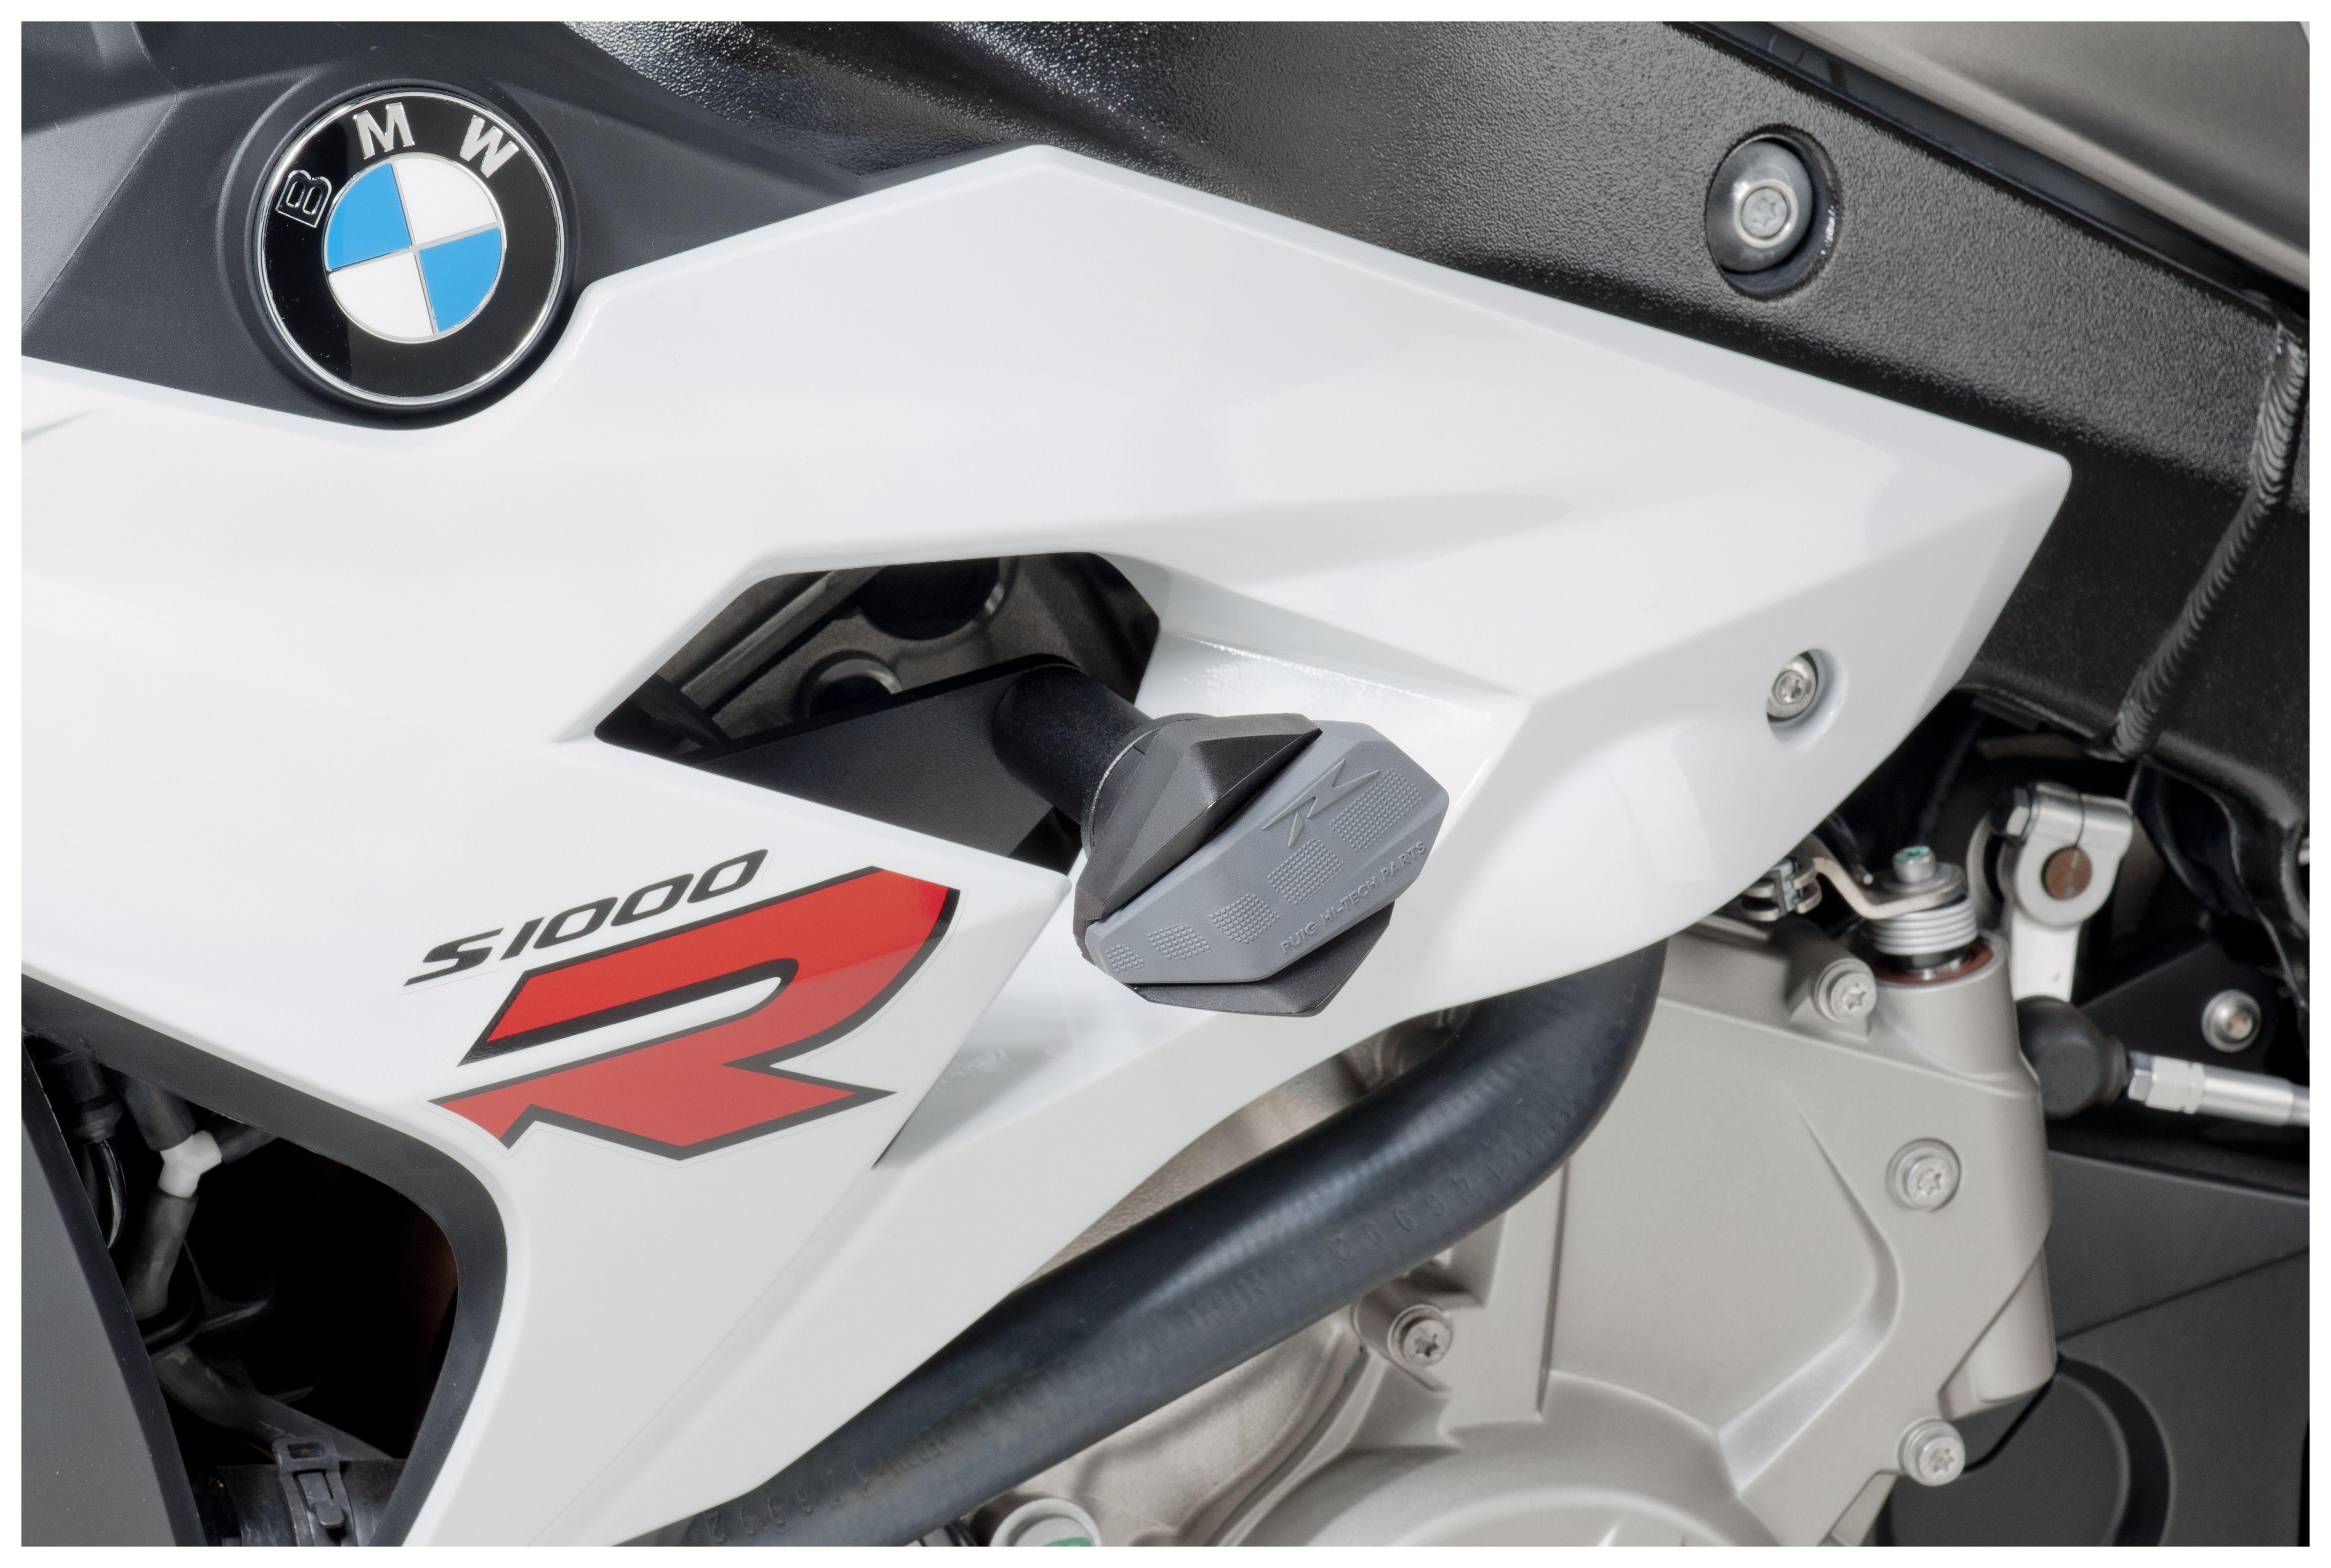 Puig R12 Frame Sliders BMW S1000R 2014-2016 - Cycle Gear